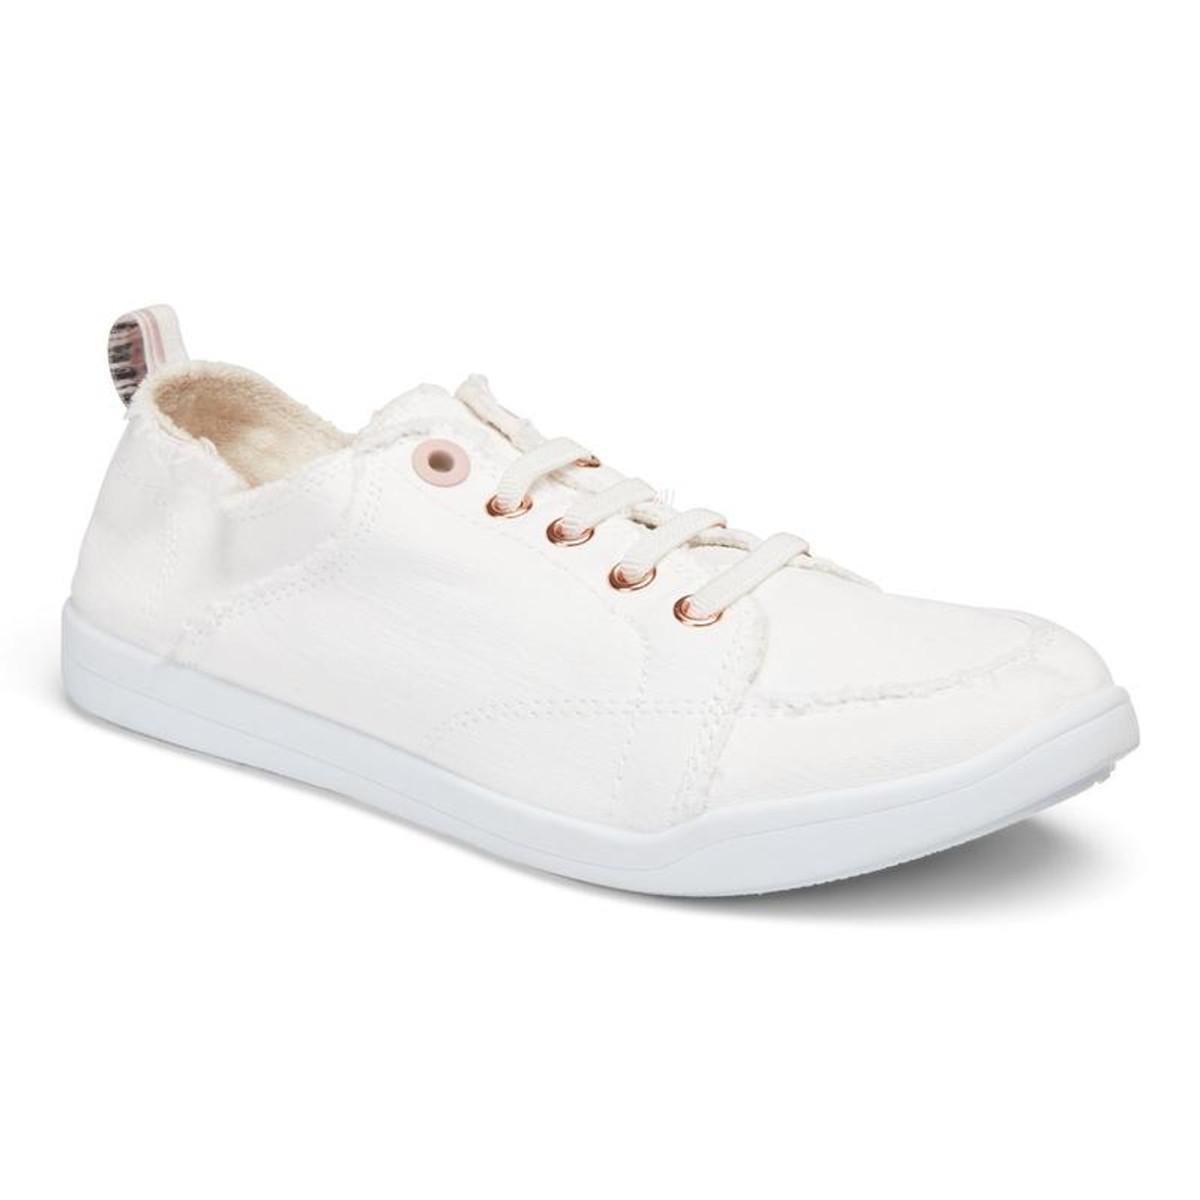 Pismo sneaker-cream